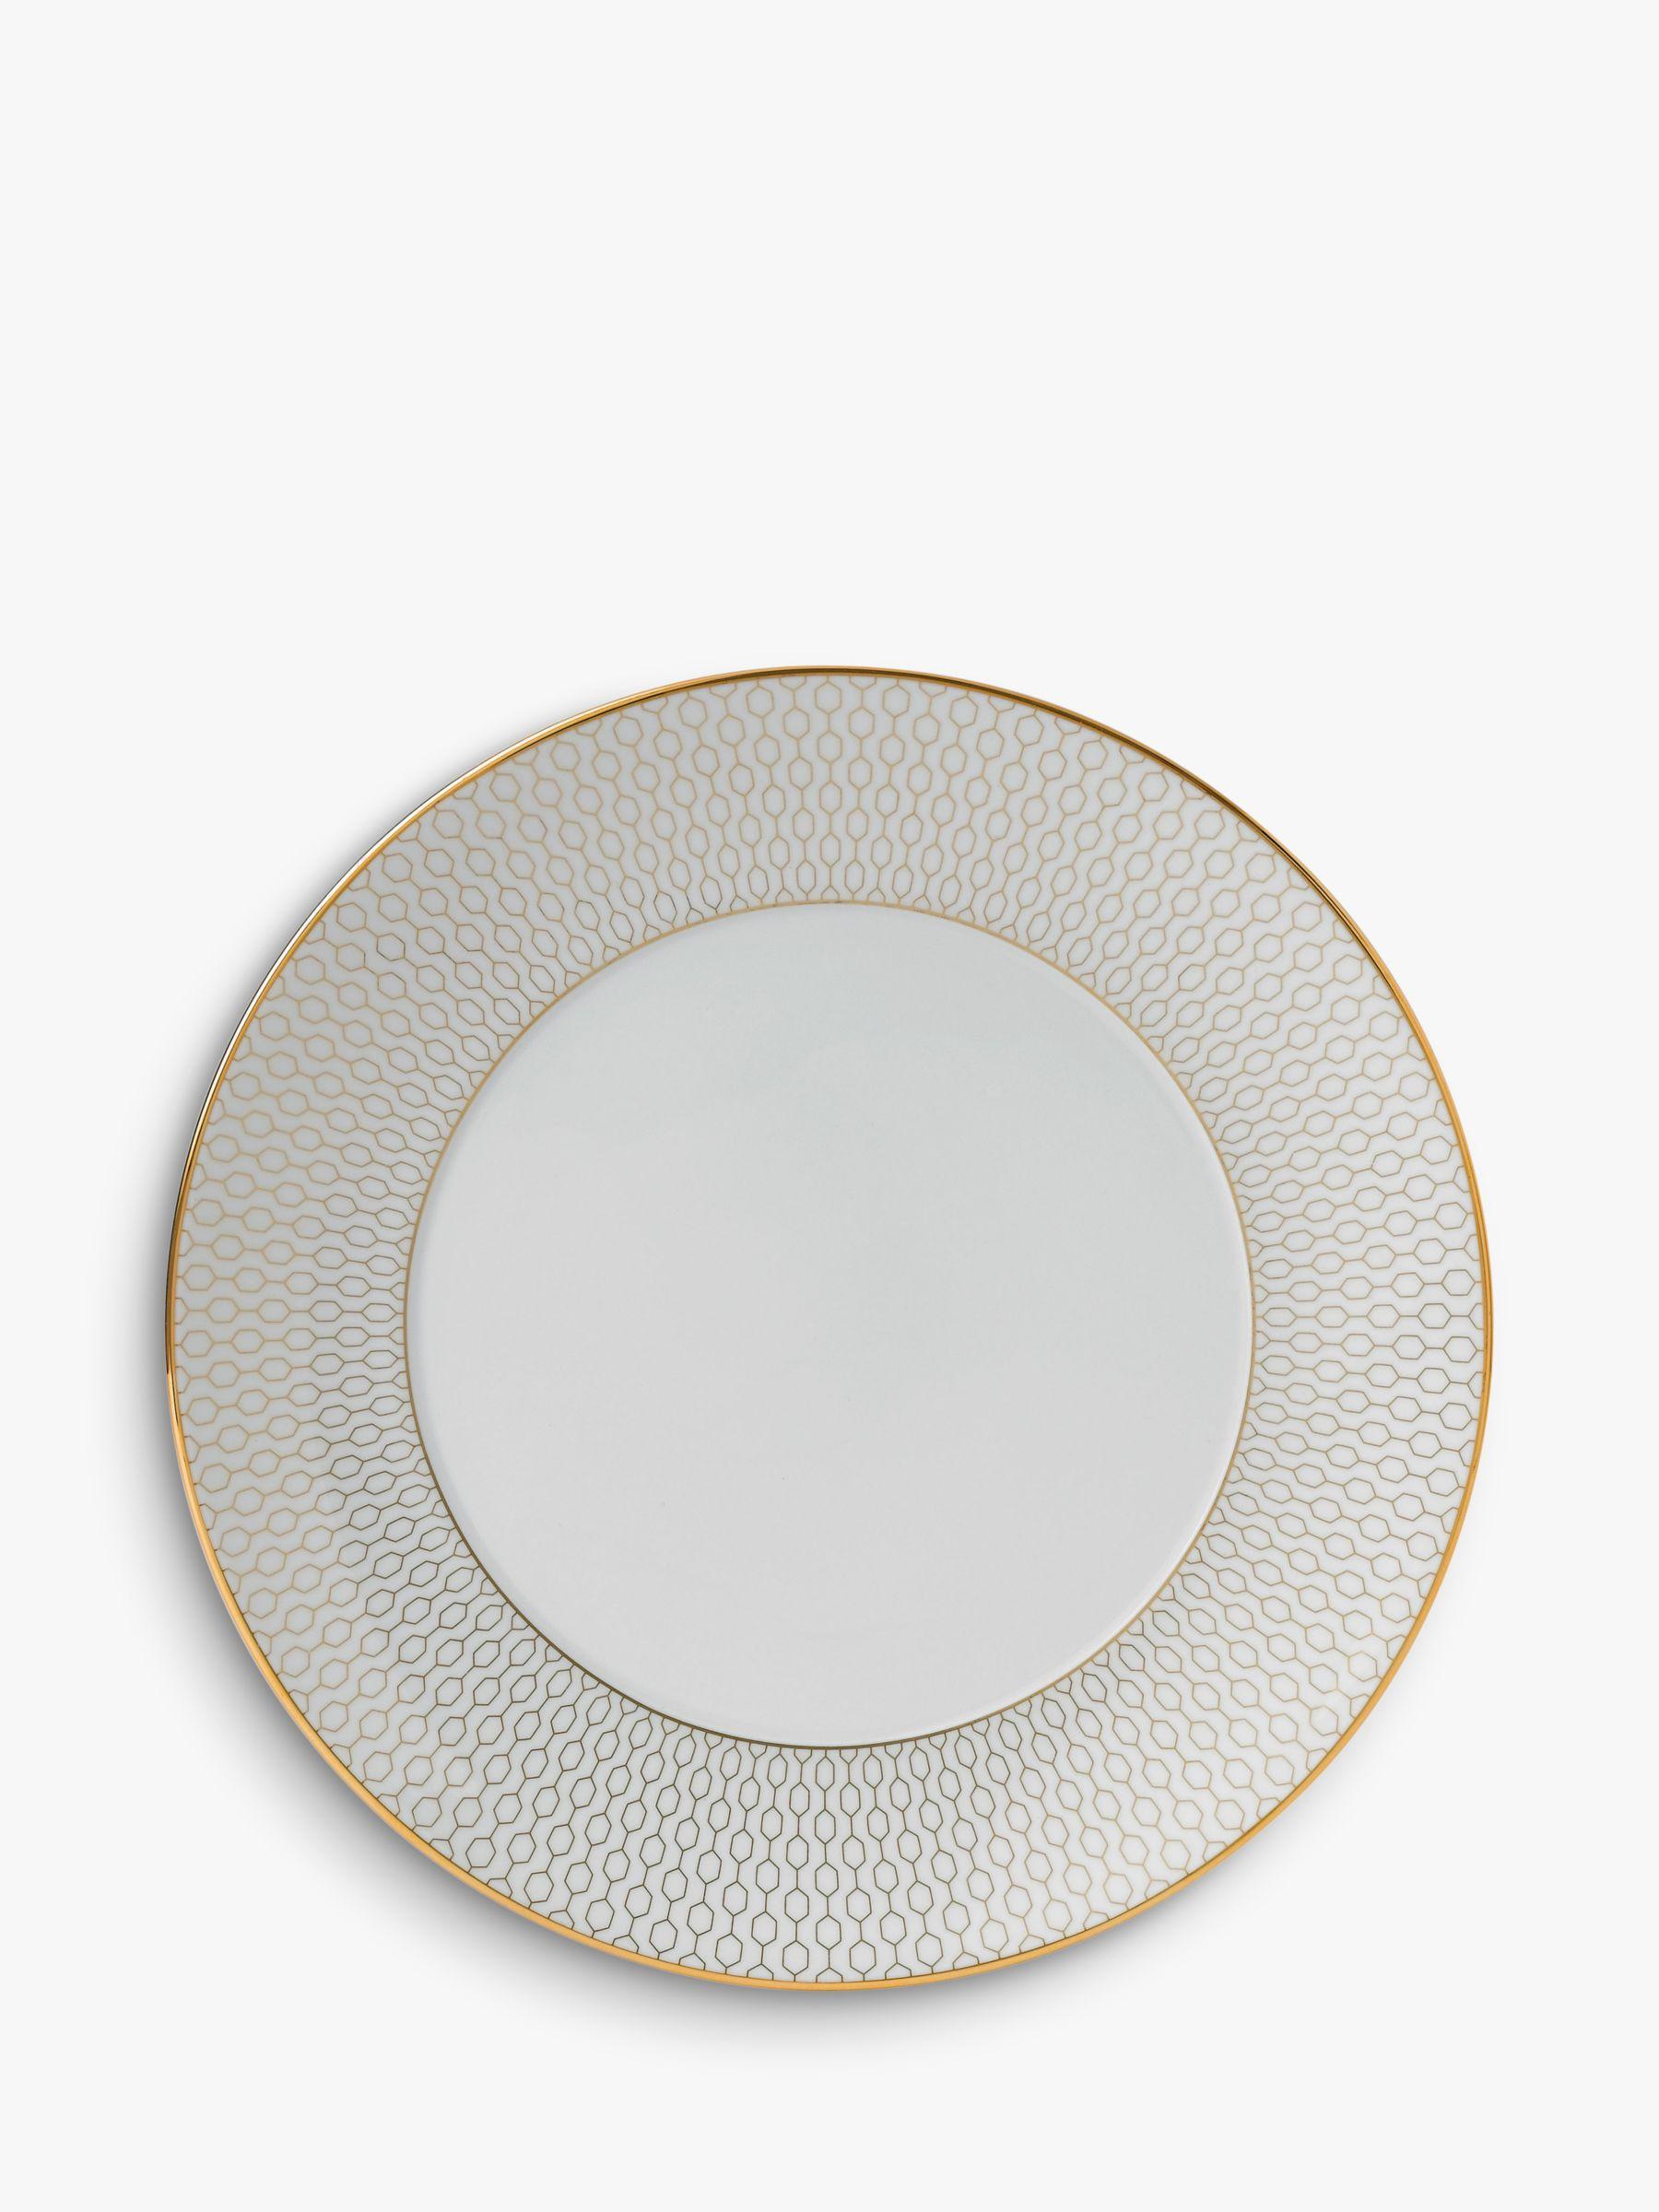 Wedgwood Wedgwood Arris Salad Plate, 20cm, Gold/White